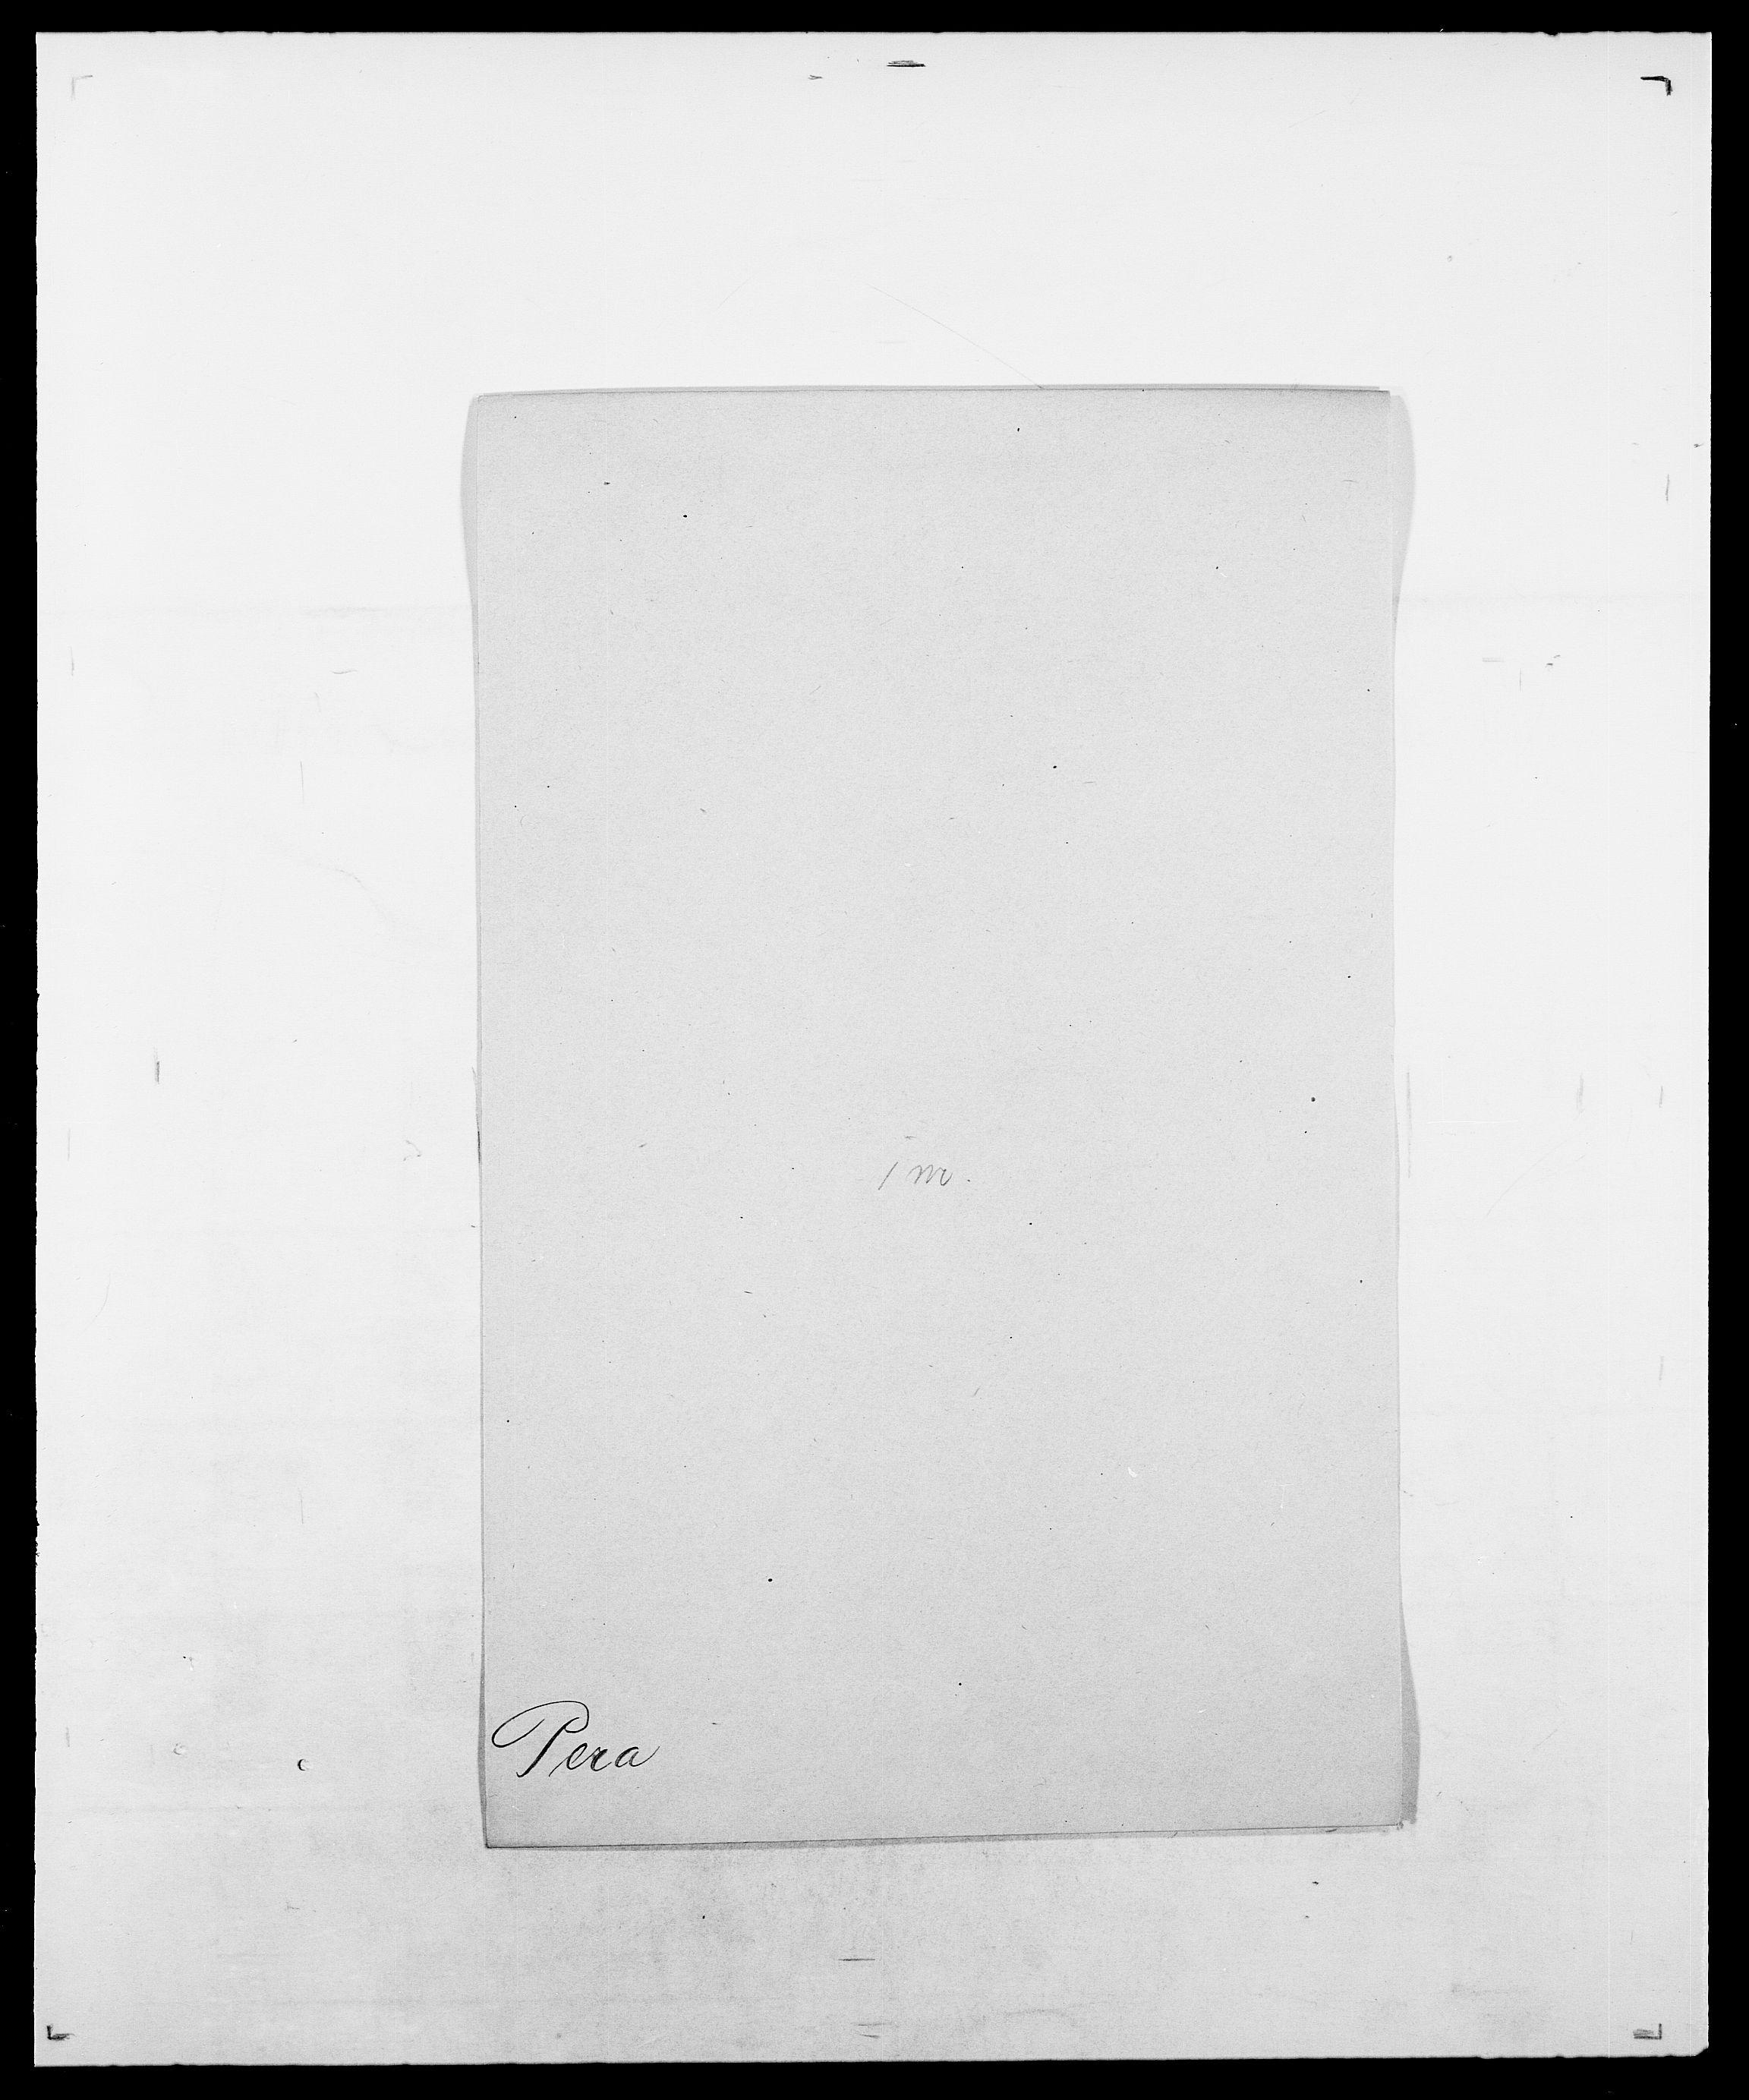 SAO, Delgobe, Charles Antoine - samling, D/Da/L0030: Paars - Pittelkov, s. 359